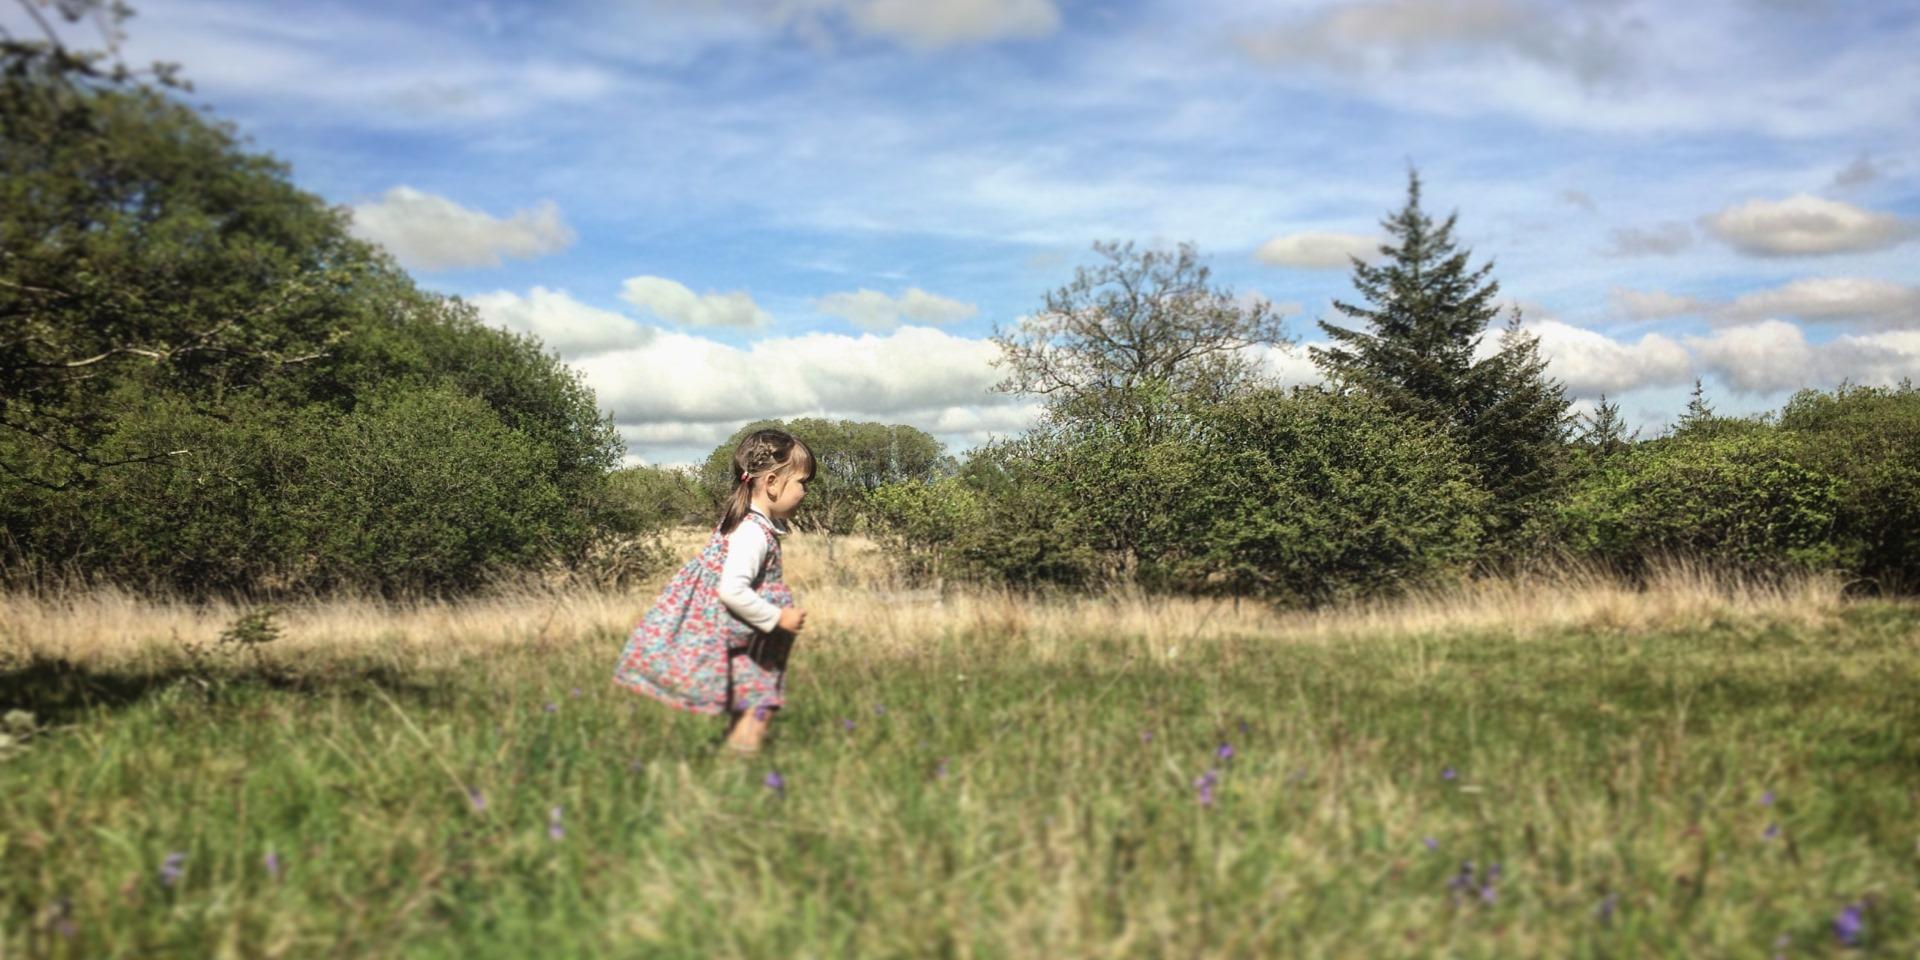 Girl wandering through meadow